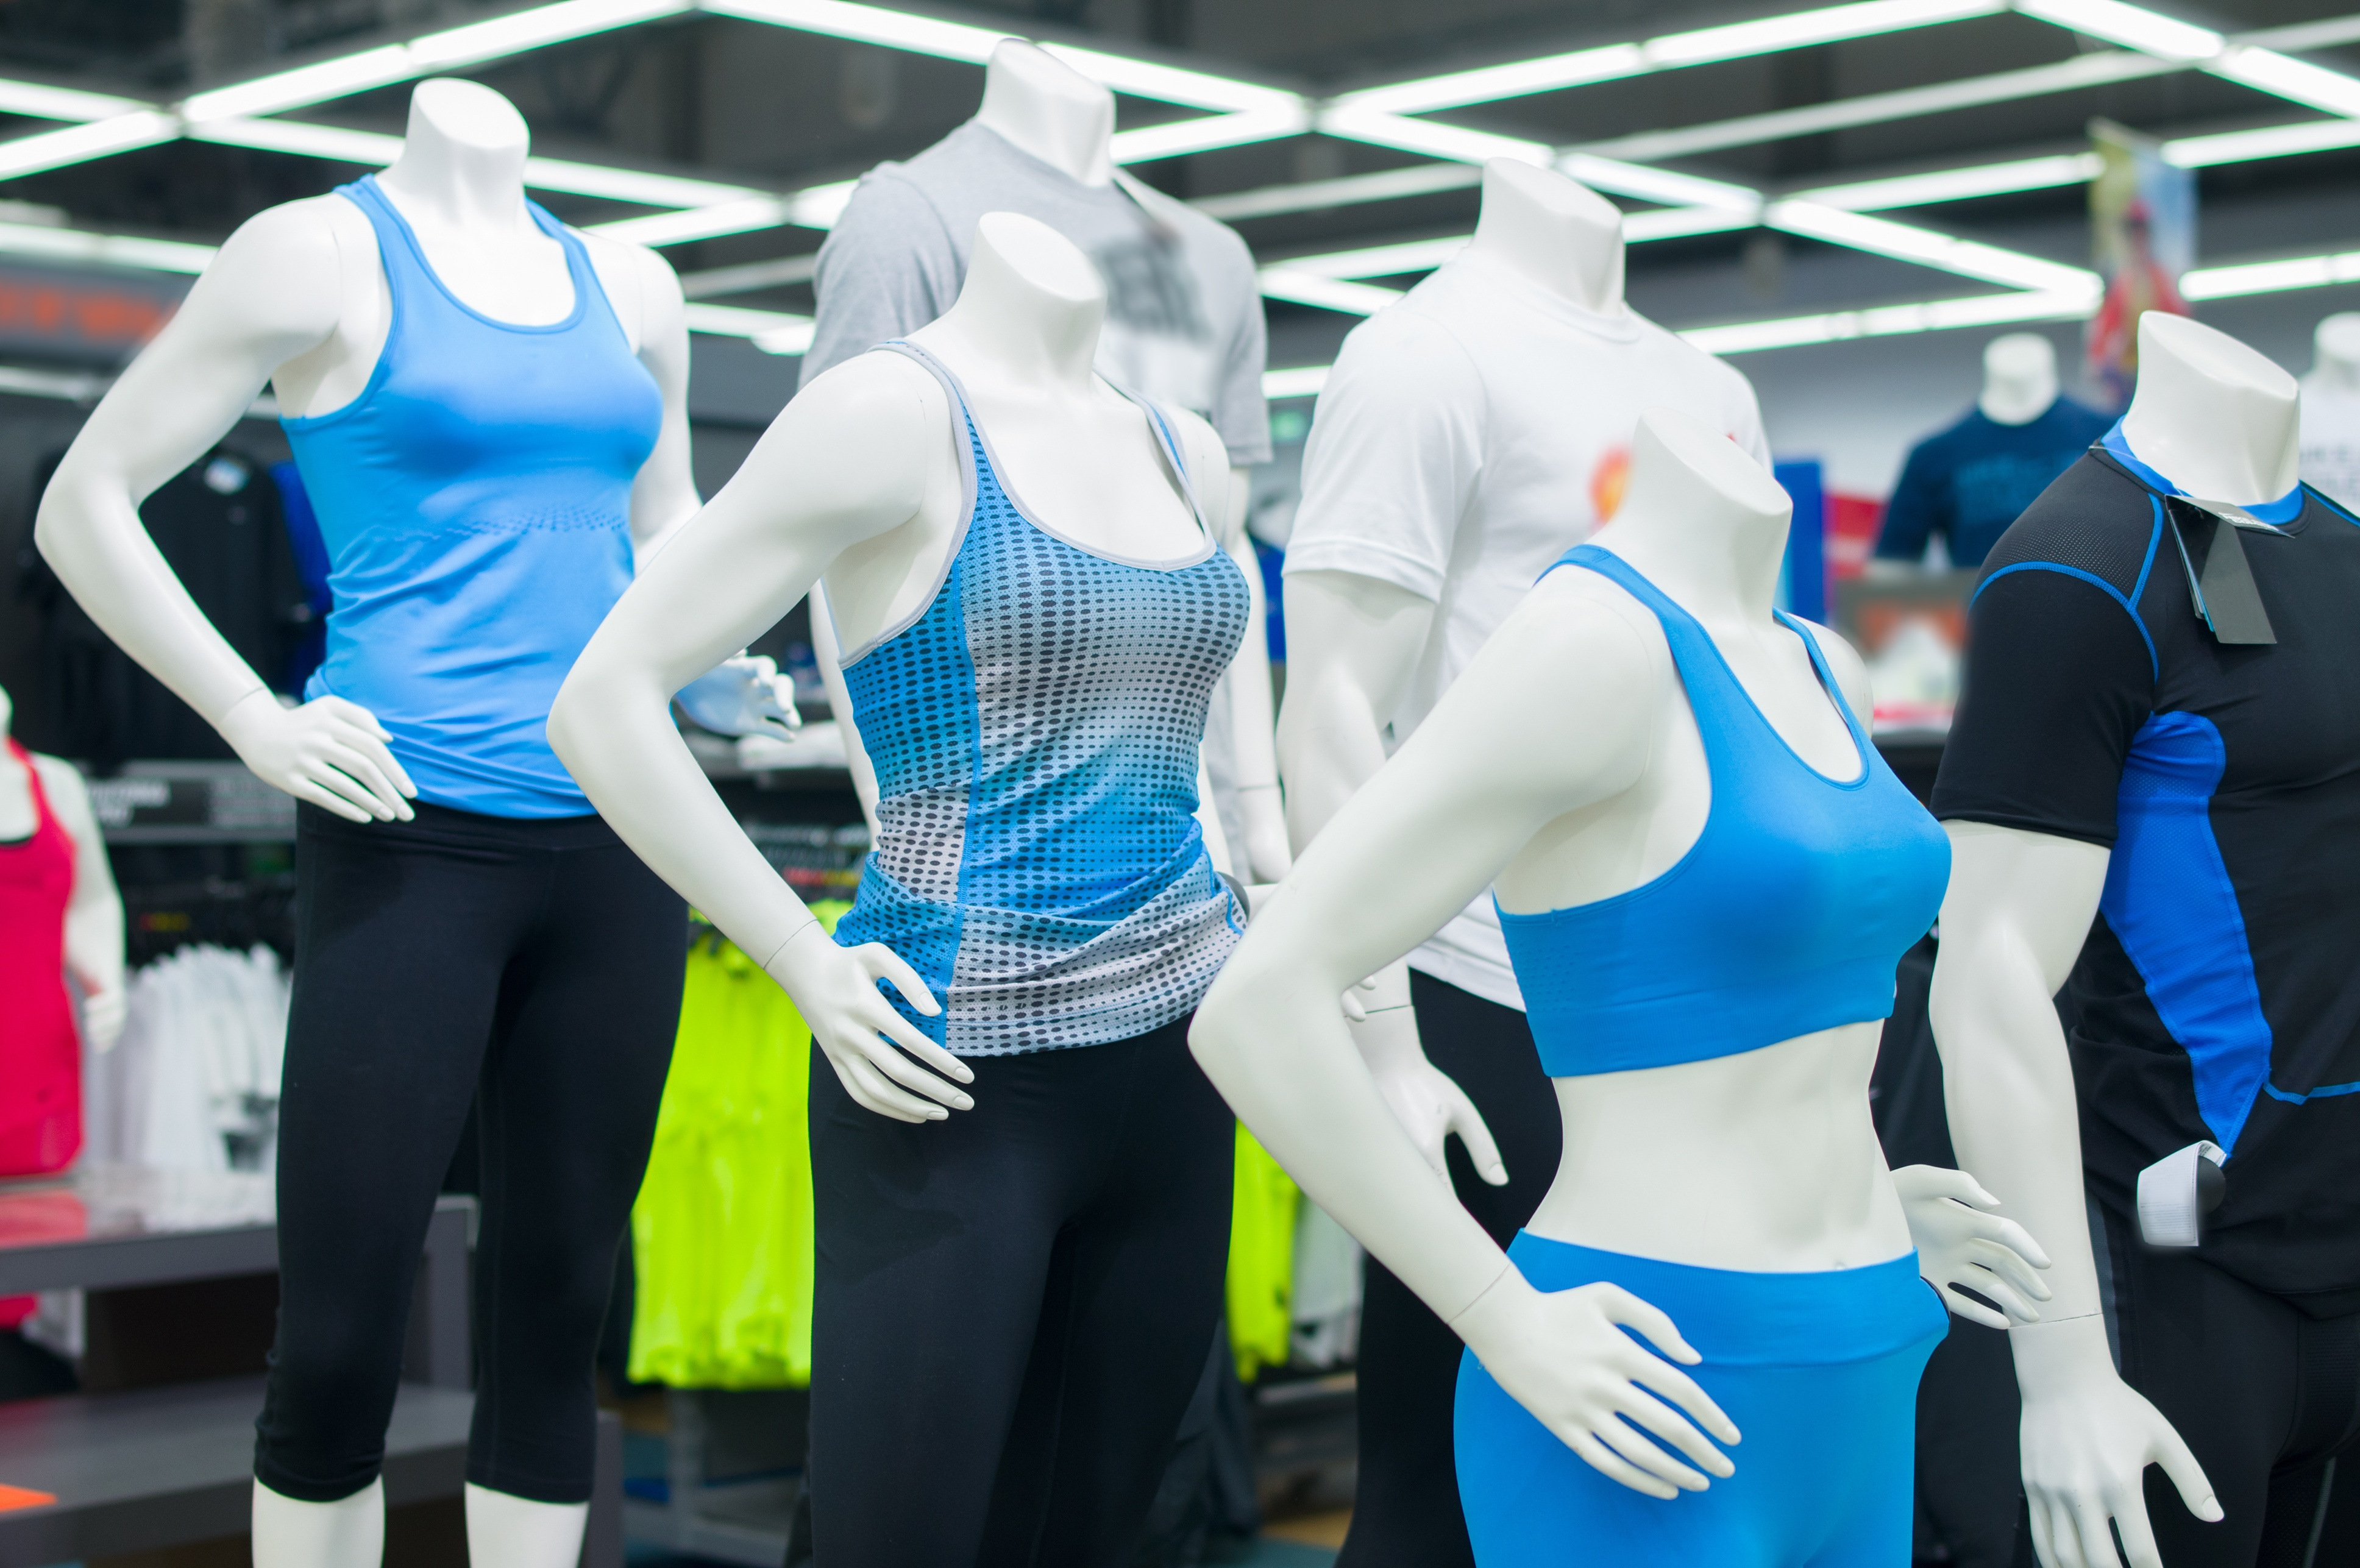 Gym clothes.jpg